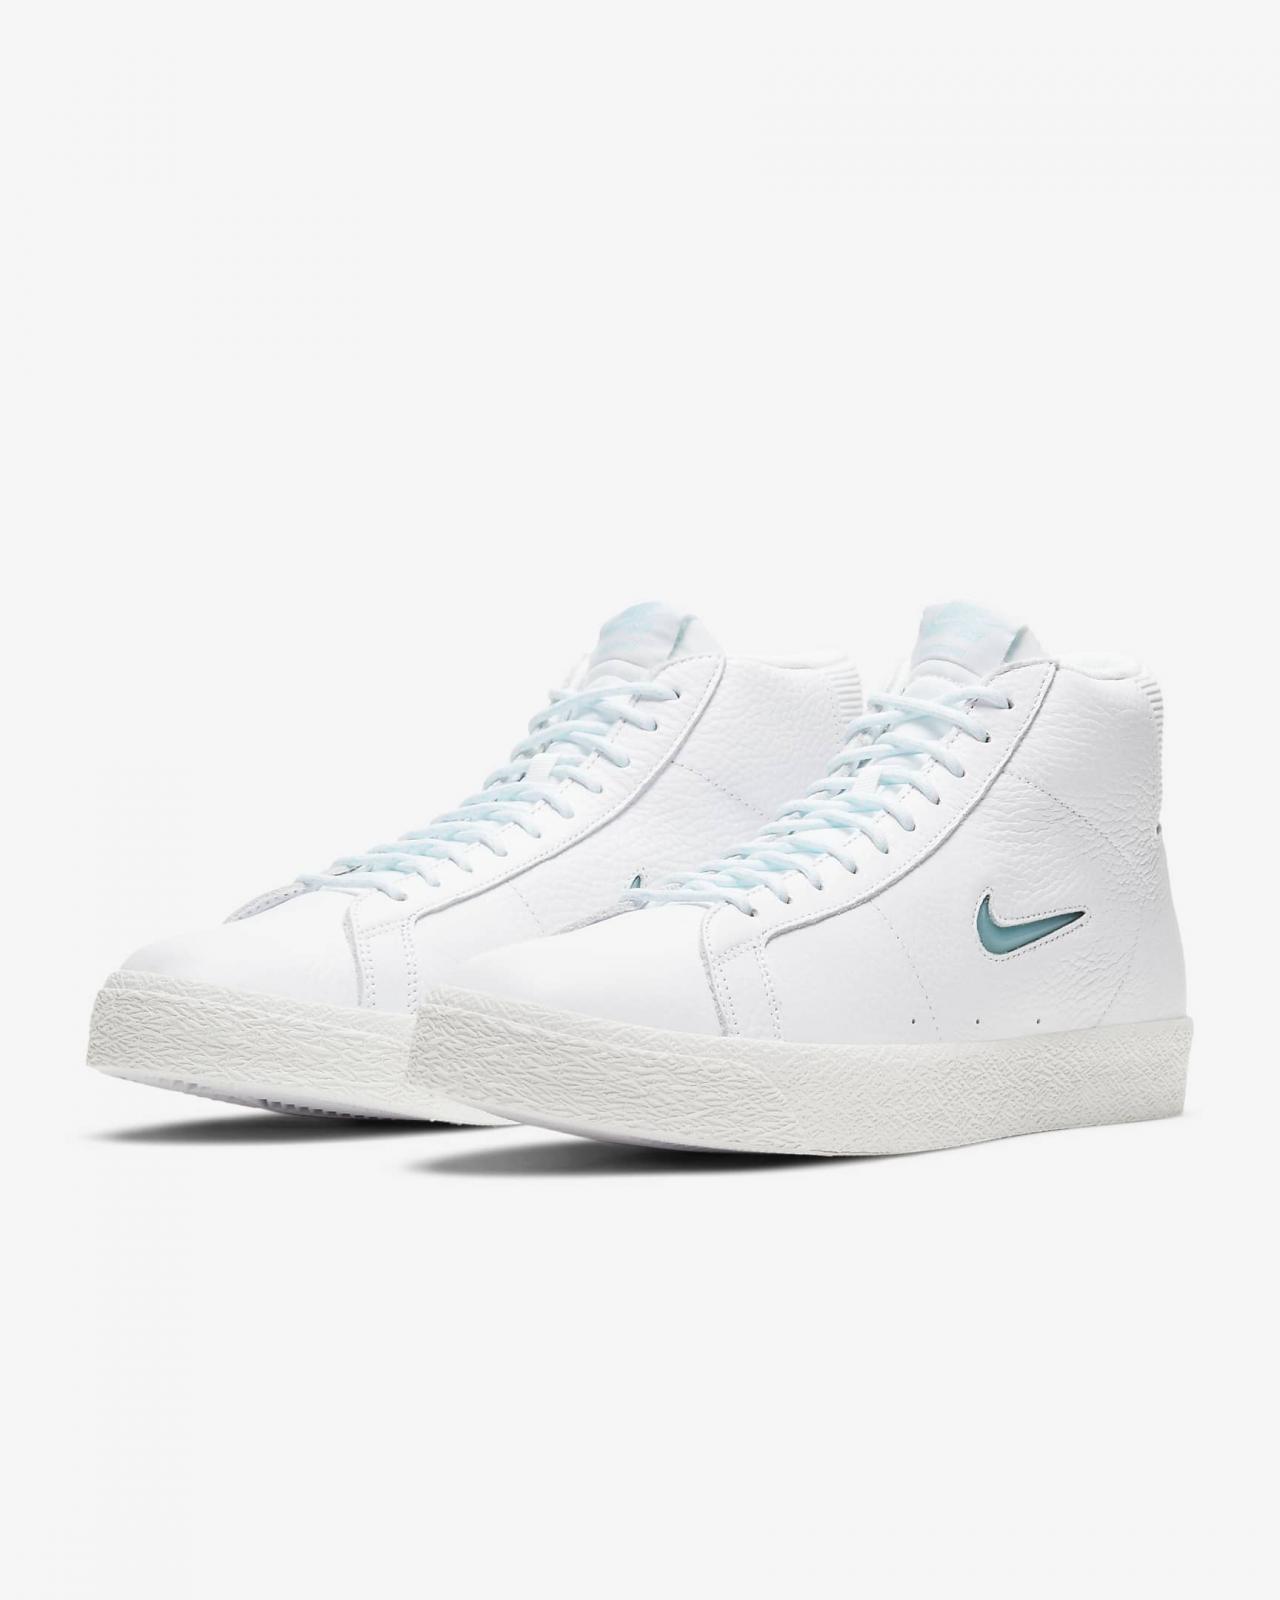 Nike SB推出全新白/山峰白/冰河蓝色Zoom Blazer Mid PRM